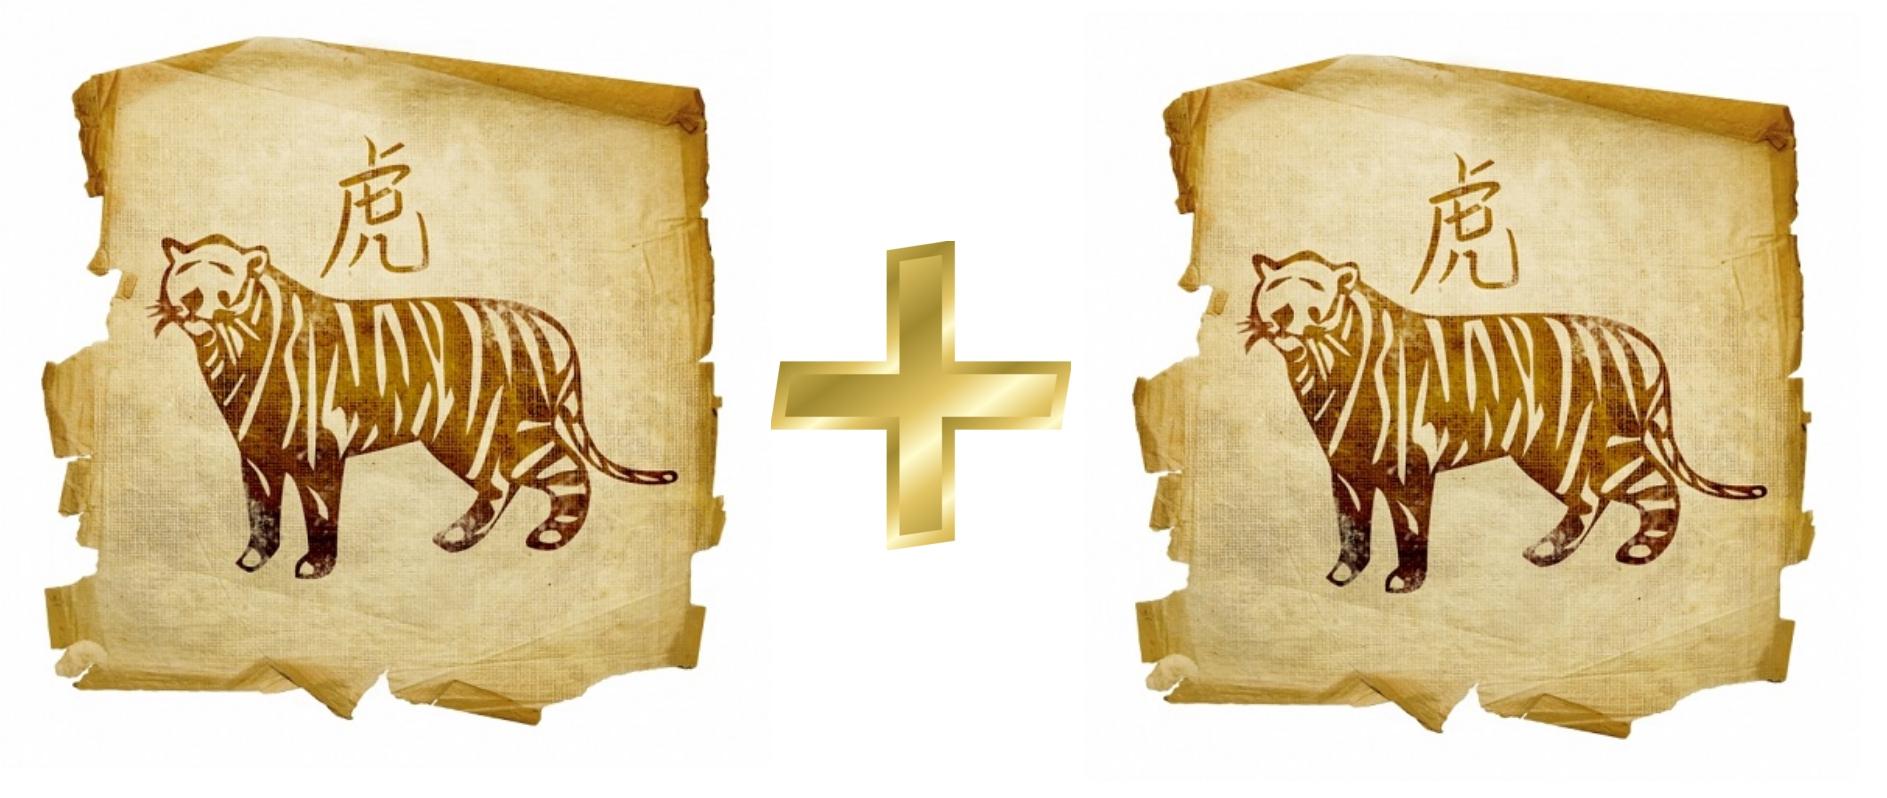 Гороскоп совместимости Тигра и Тигра в любви